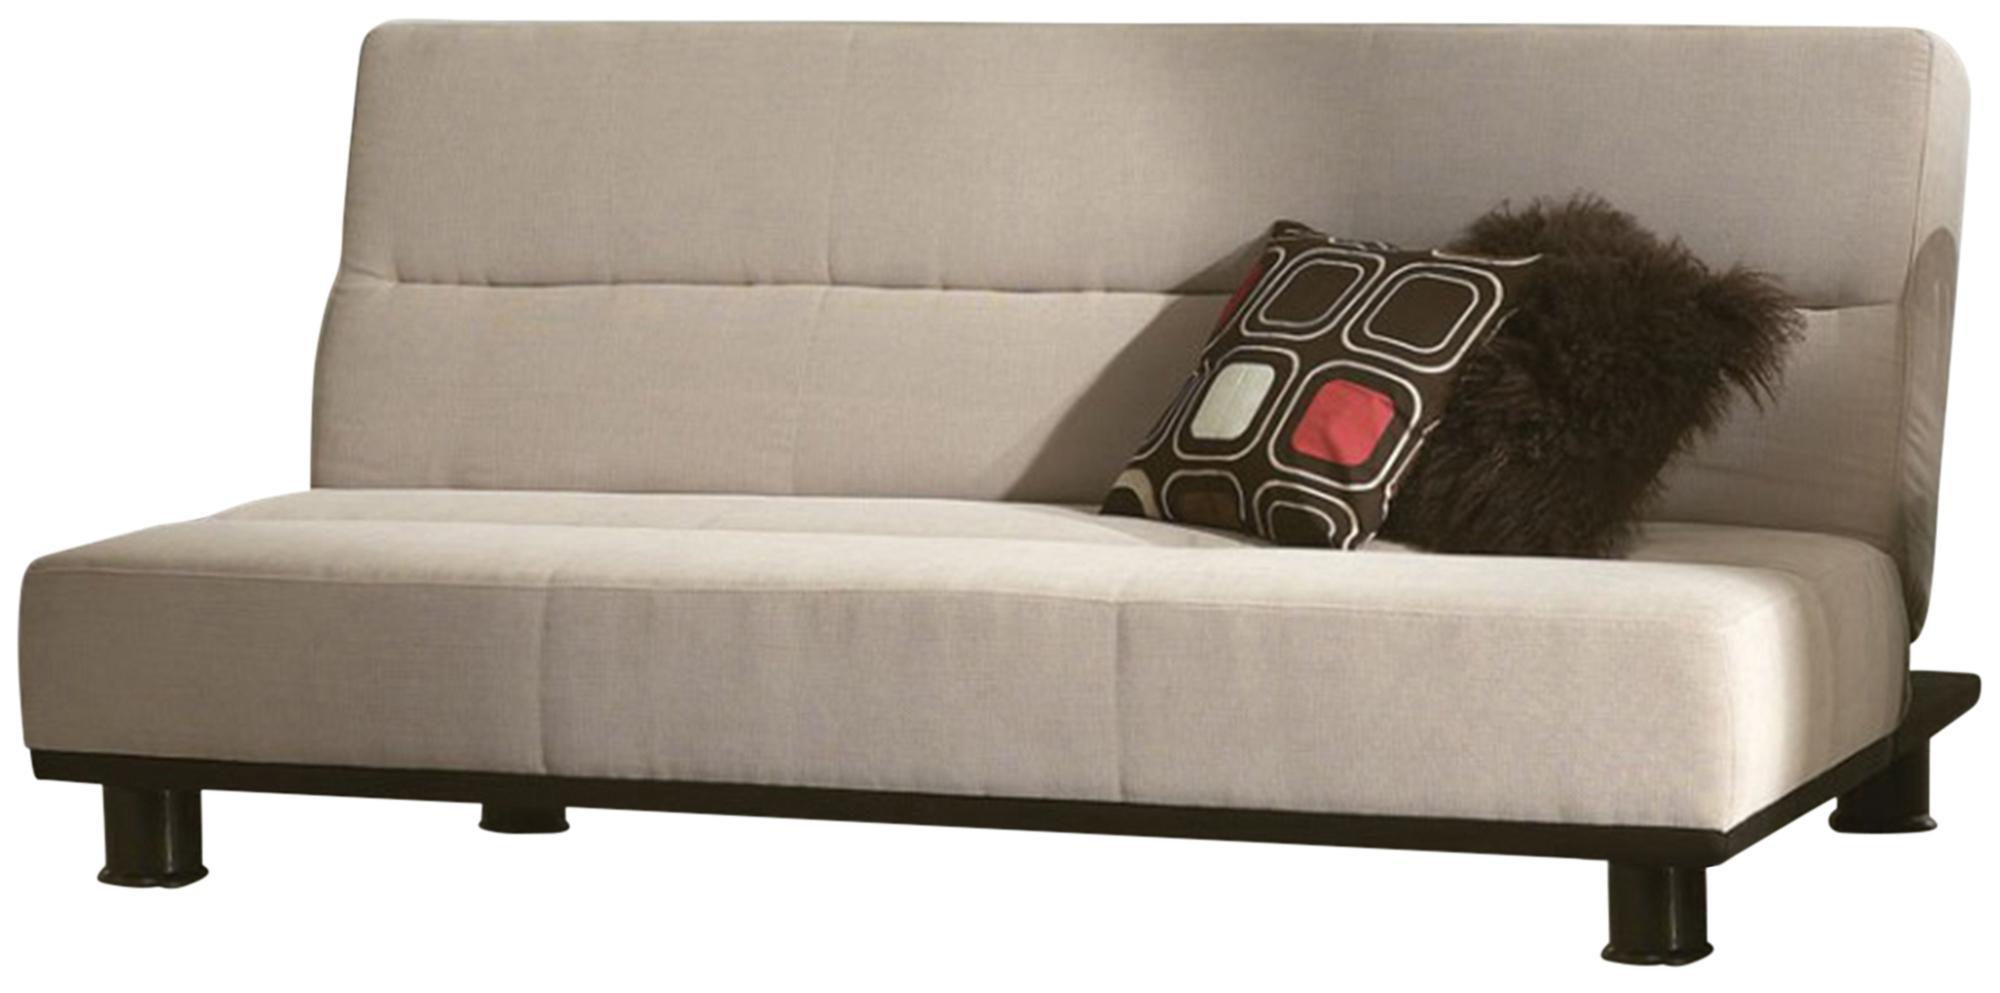 Marks and Spencer Vintage Print Rug : dublin sofa bed beige from myhomeneedsthat.com size 2000 x 993 jpeg 104kB